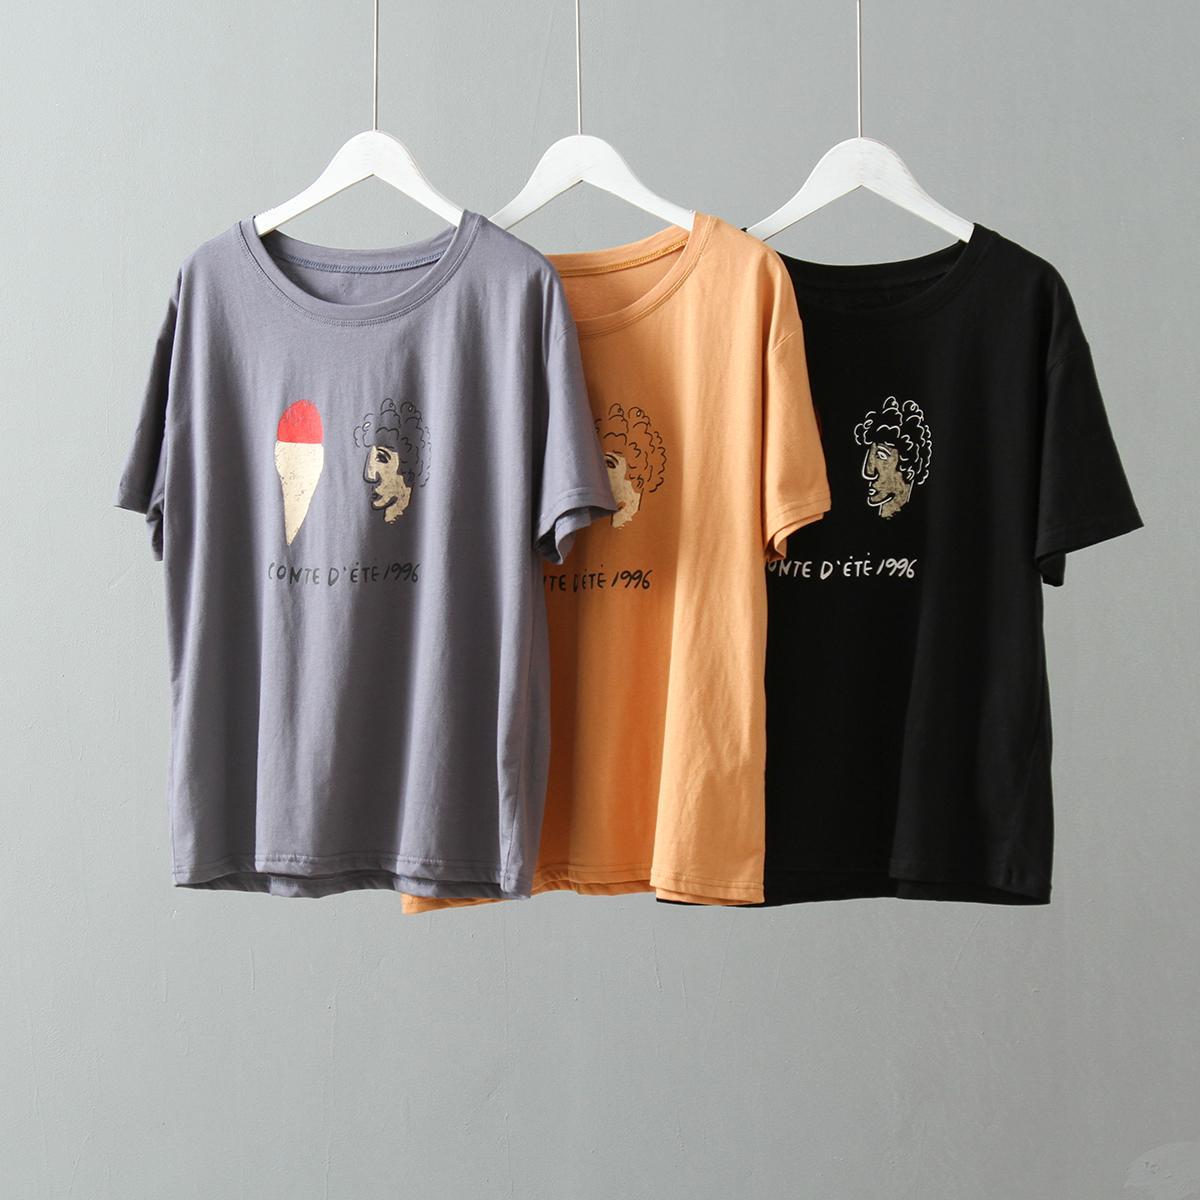 Qiukichonson Printed Women Tshirt 2019 Korean Fashion Summer Top O-Neck Short Sleeve Casual Tee Shirt Femme